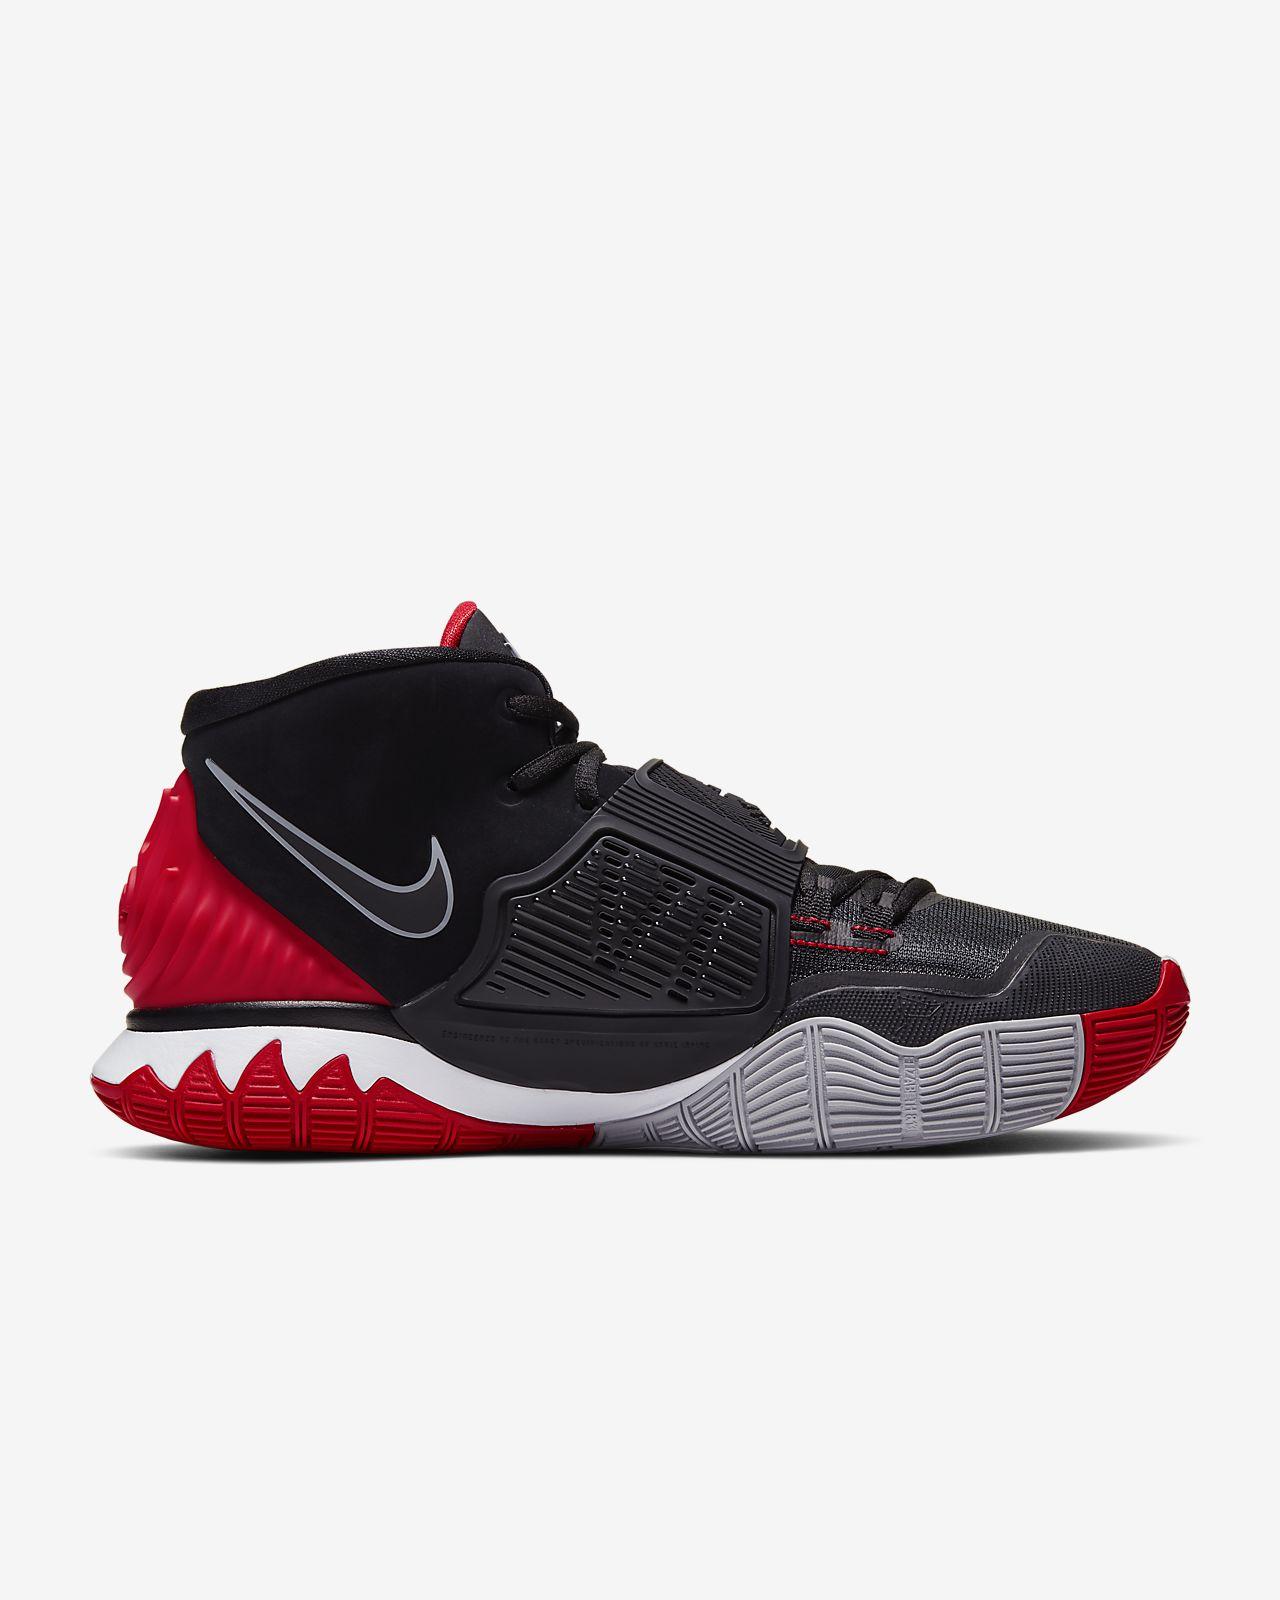 Chaussure de basketball Kyrie 6. Nike CA